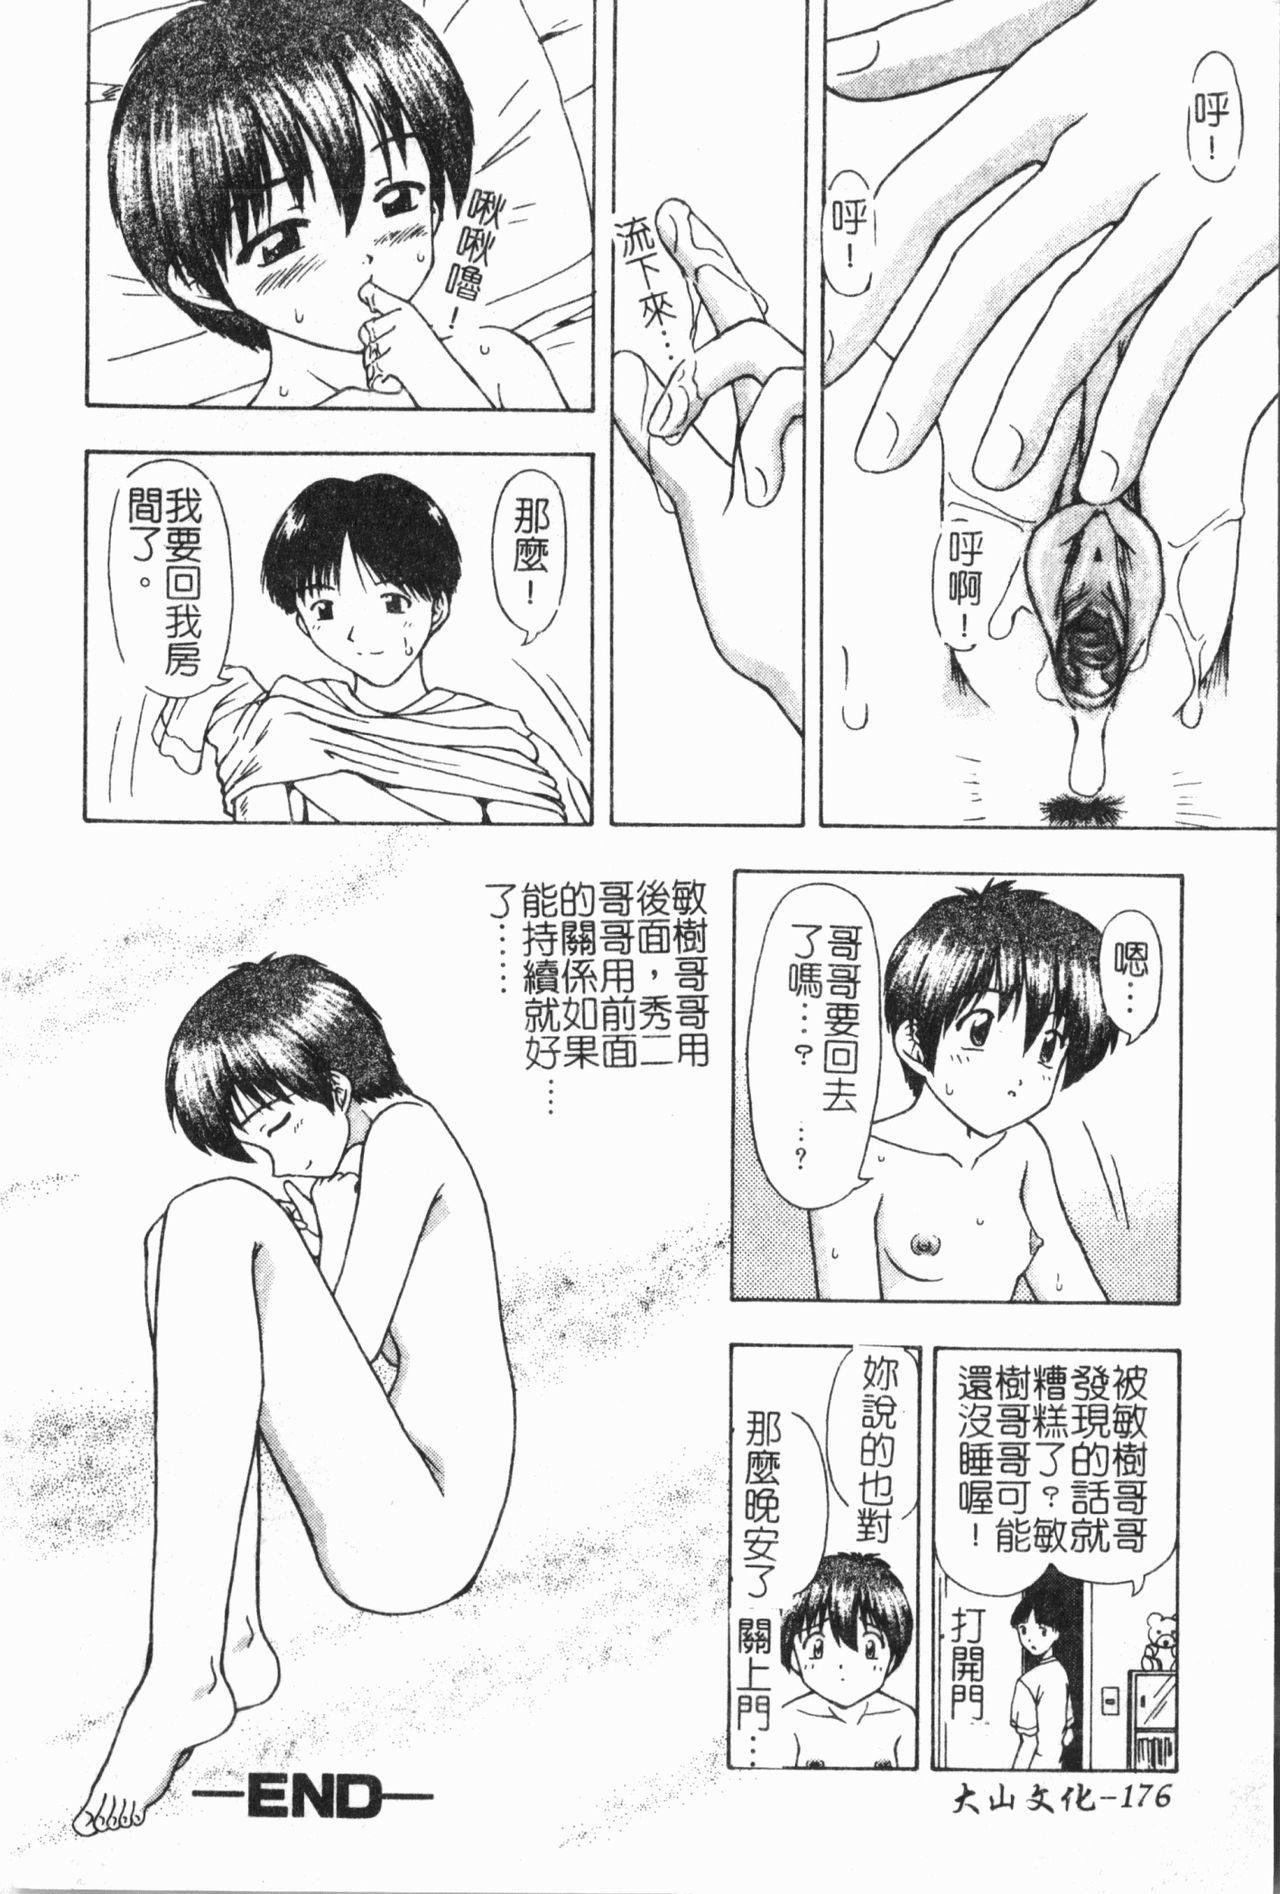 Imouto Koishi 6 178